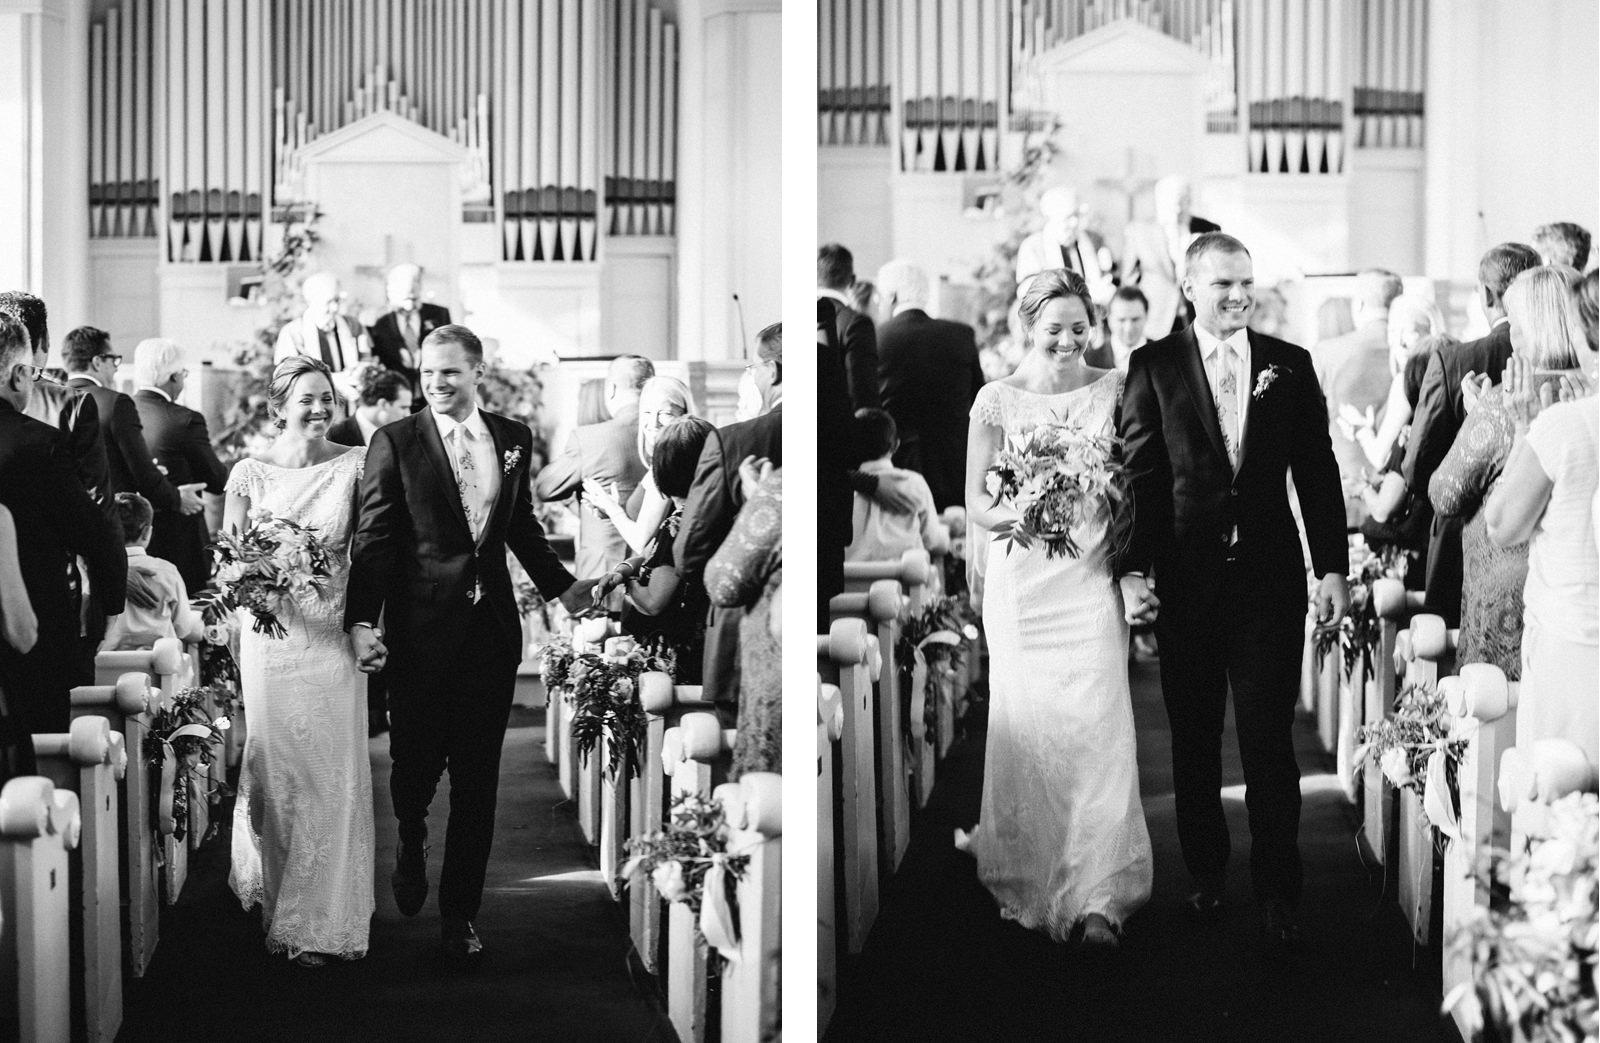 bridgeport-wedding-082 BRIDGEPORT, CONNECTICUT BACKYARD WEDDING